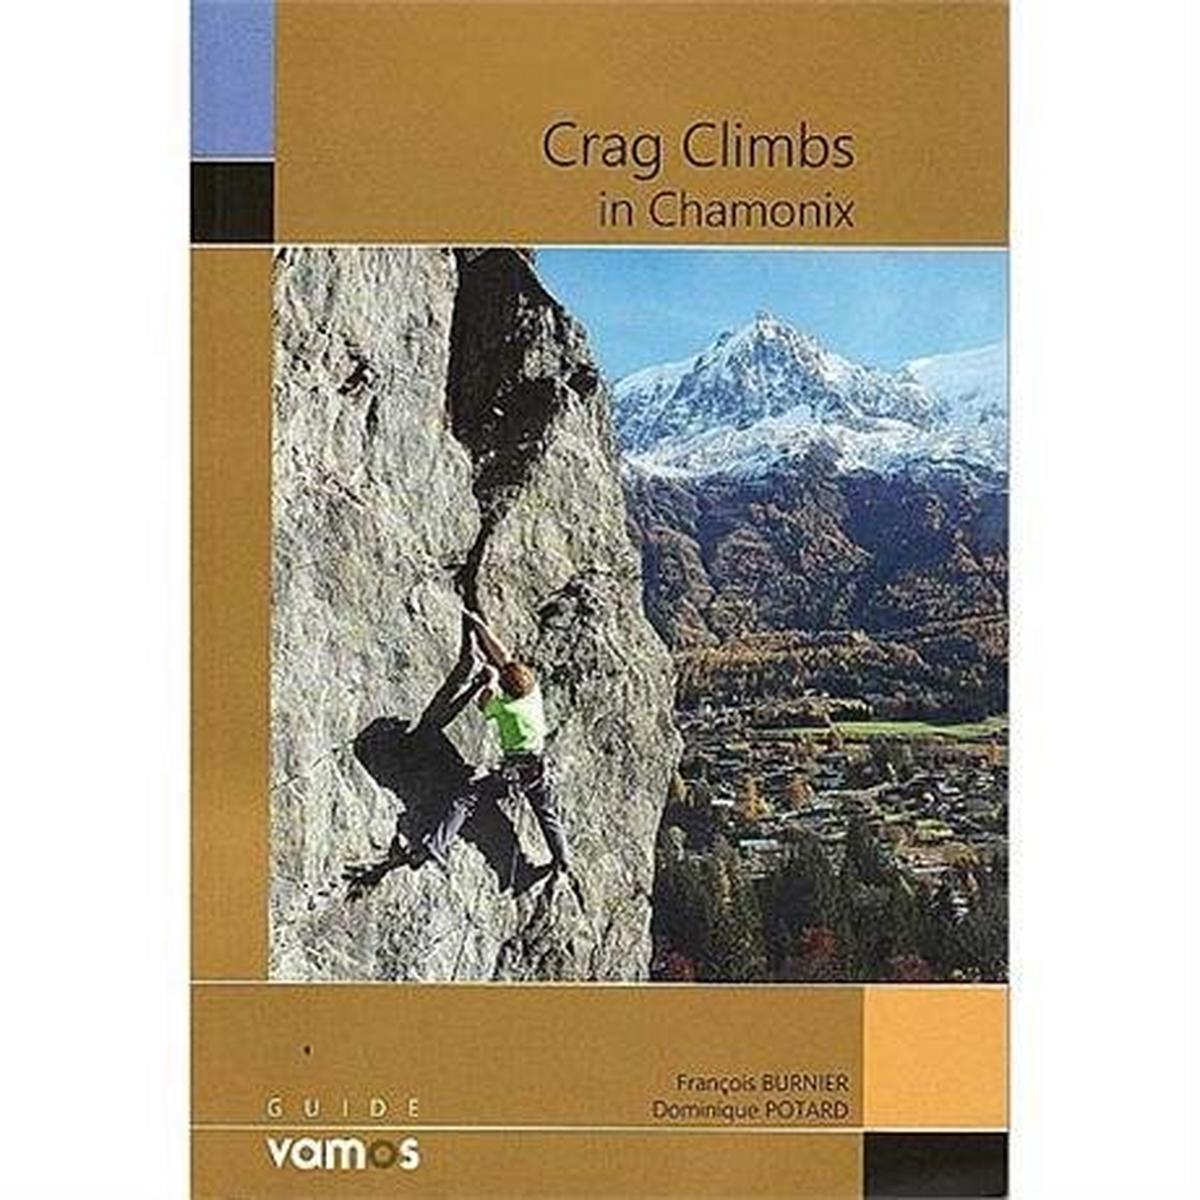 Miscellaneous Rock Climbing Guide Book: Crag Climbs in Chamonix